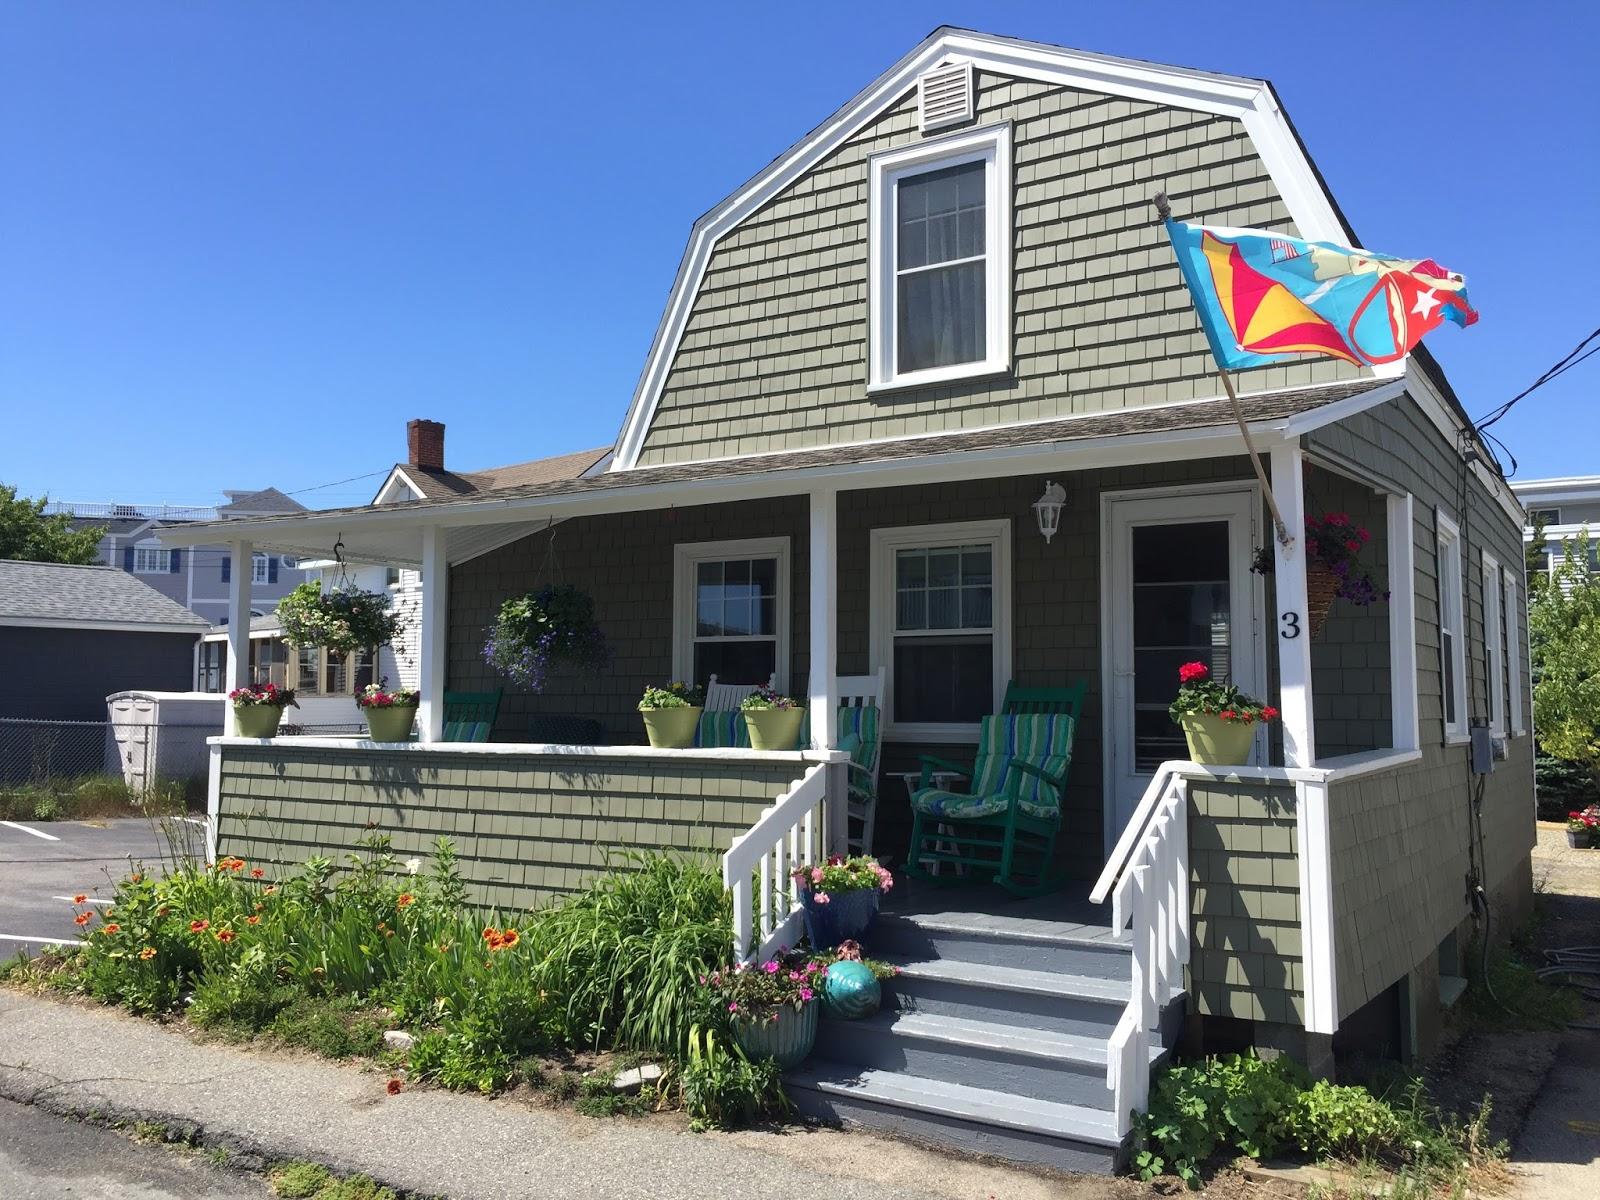 beachfront listings inn cottages hampton panama suites beach city